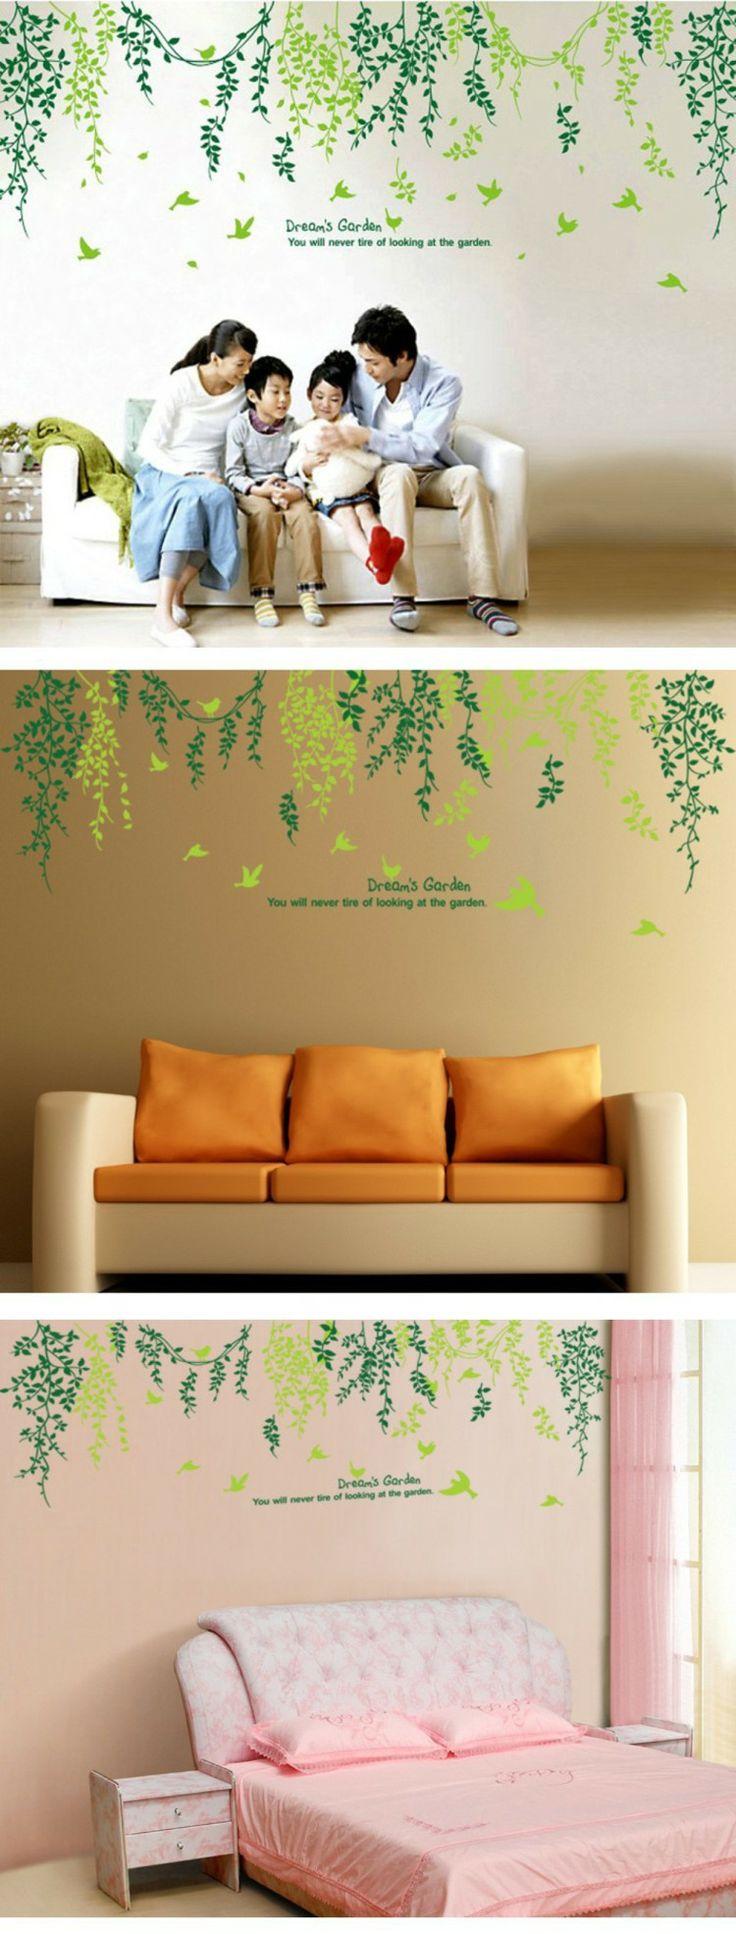 33 best vinil images on pinterest ideas para wall stickers and home naturaleza colgando del techo probarwall stickersideas